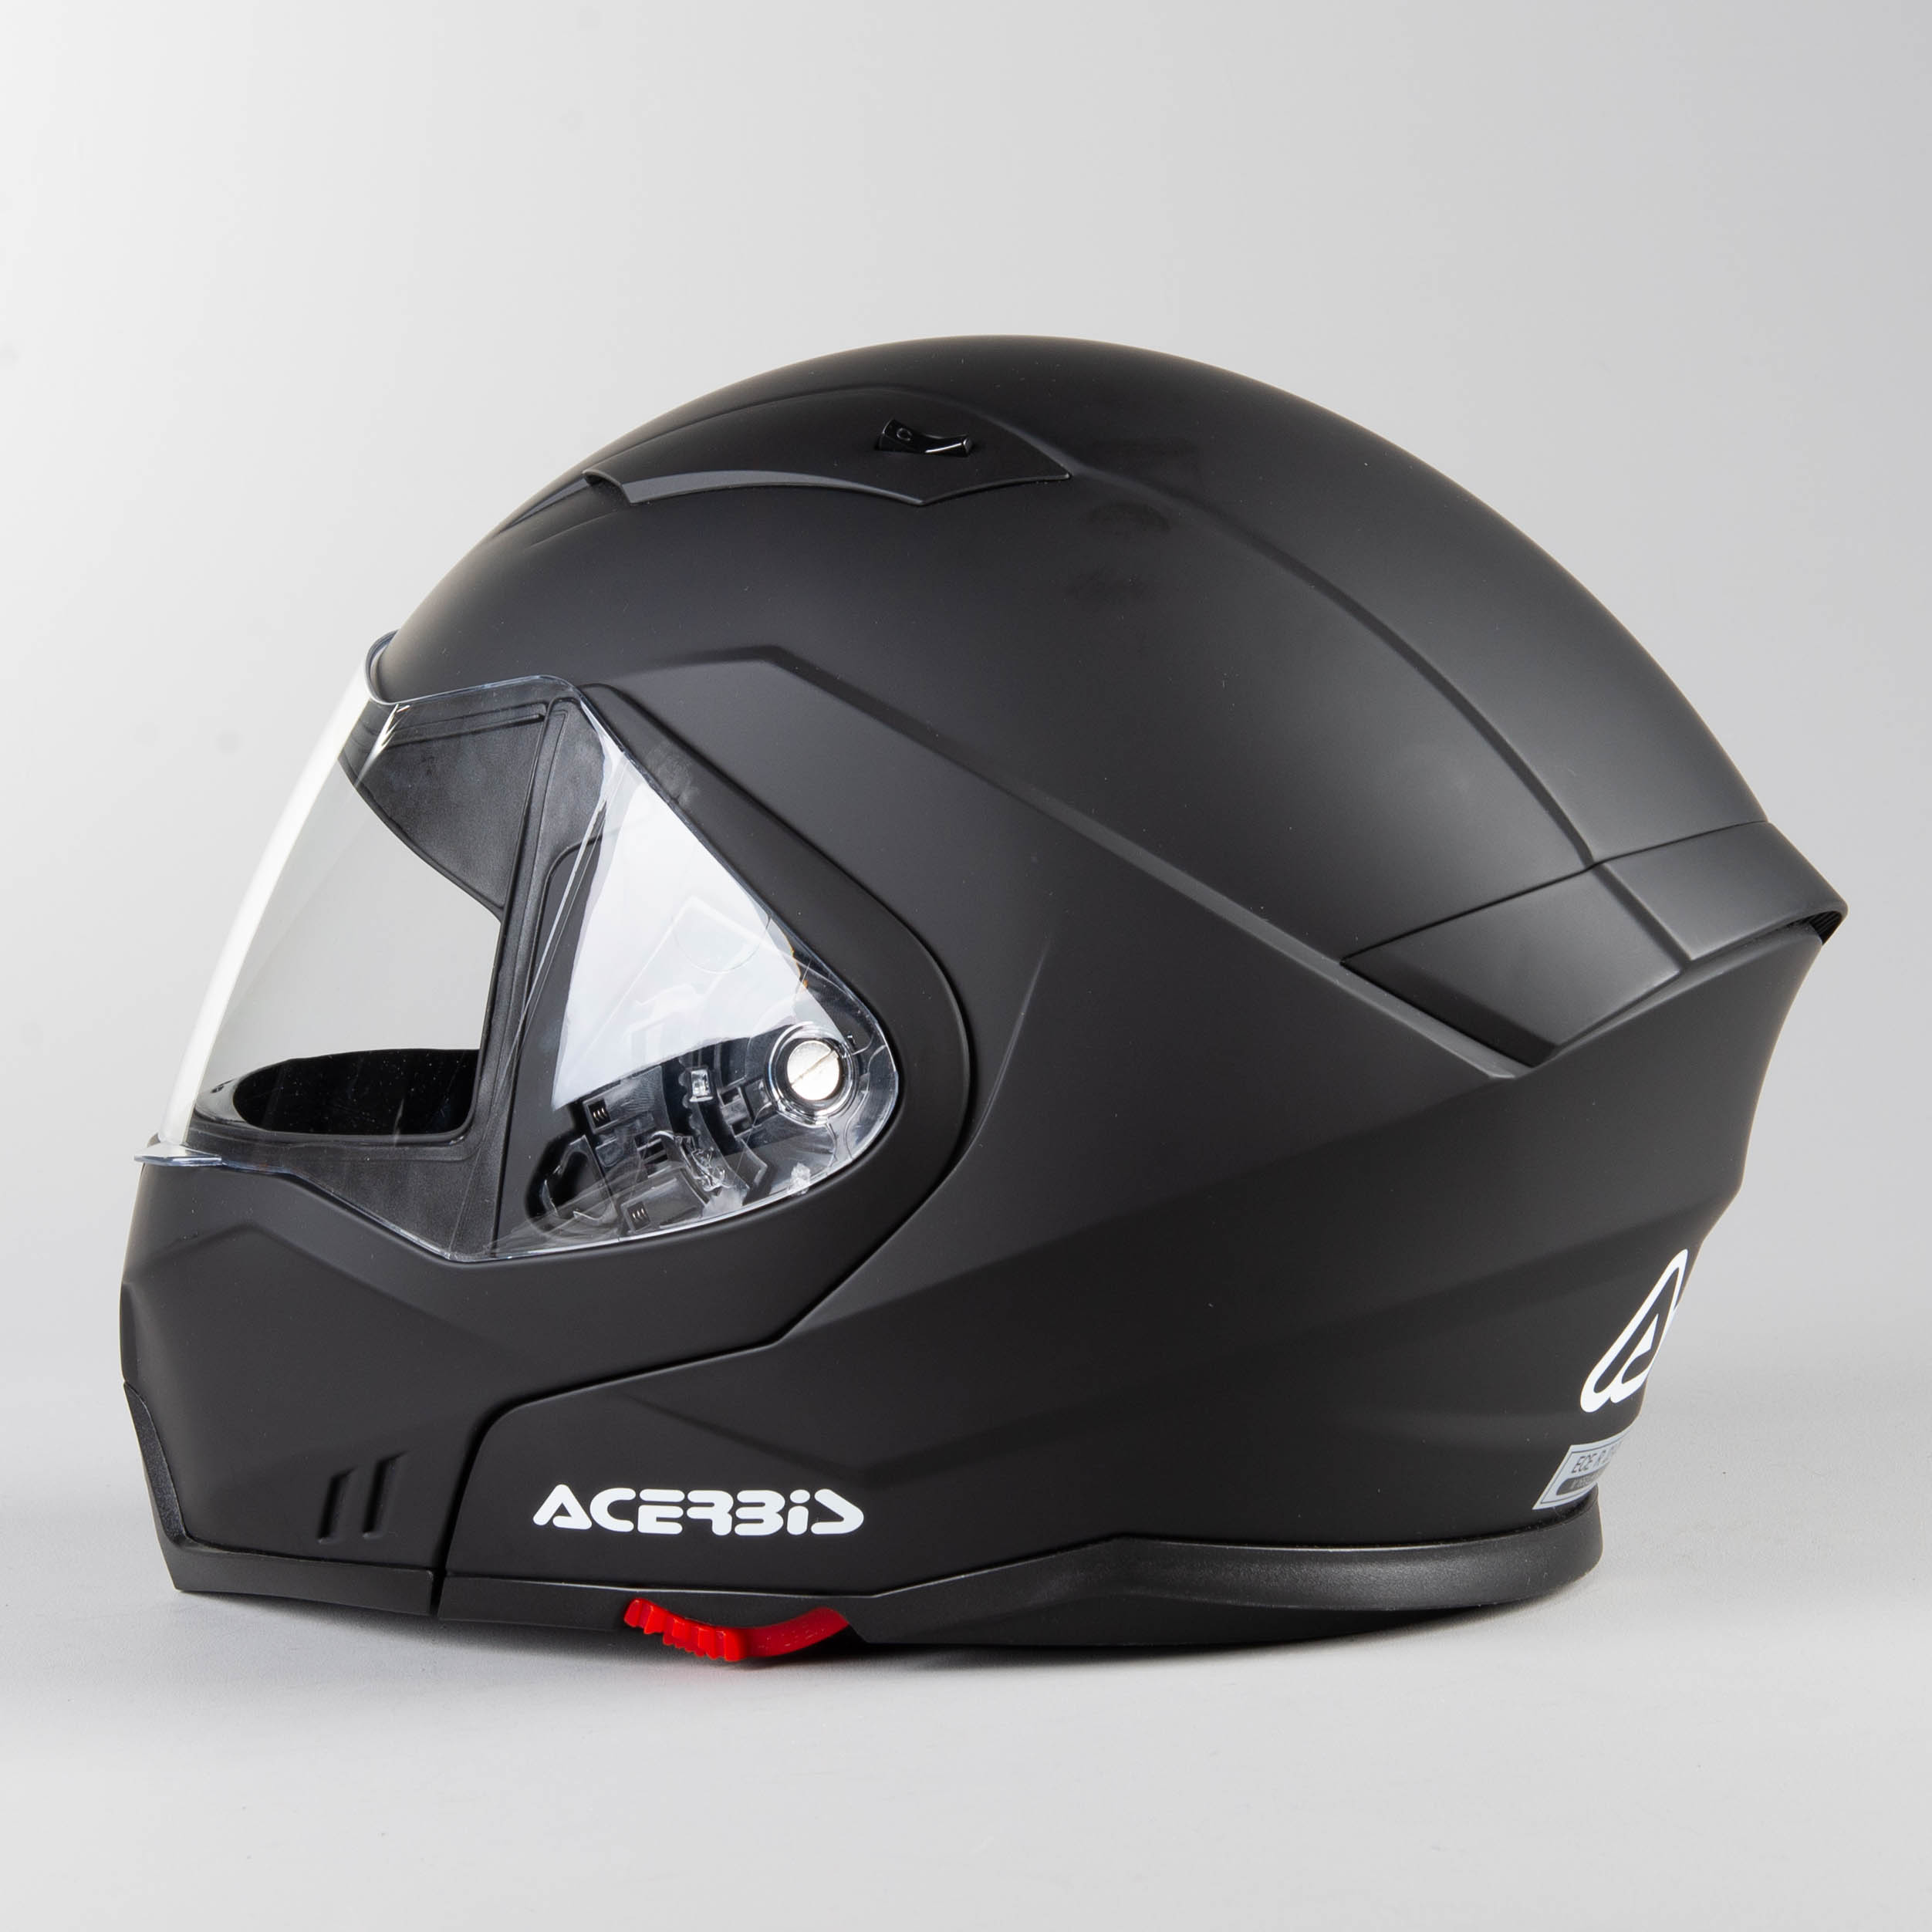 Acerbis Box G 348 Casco